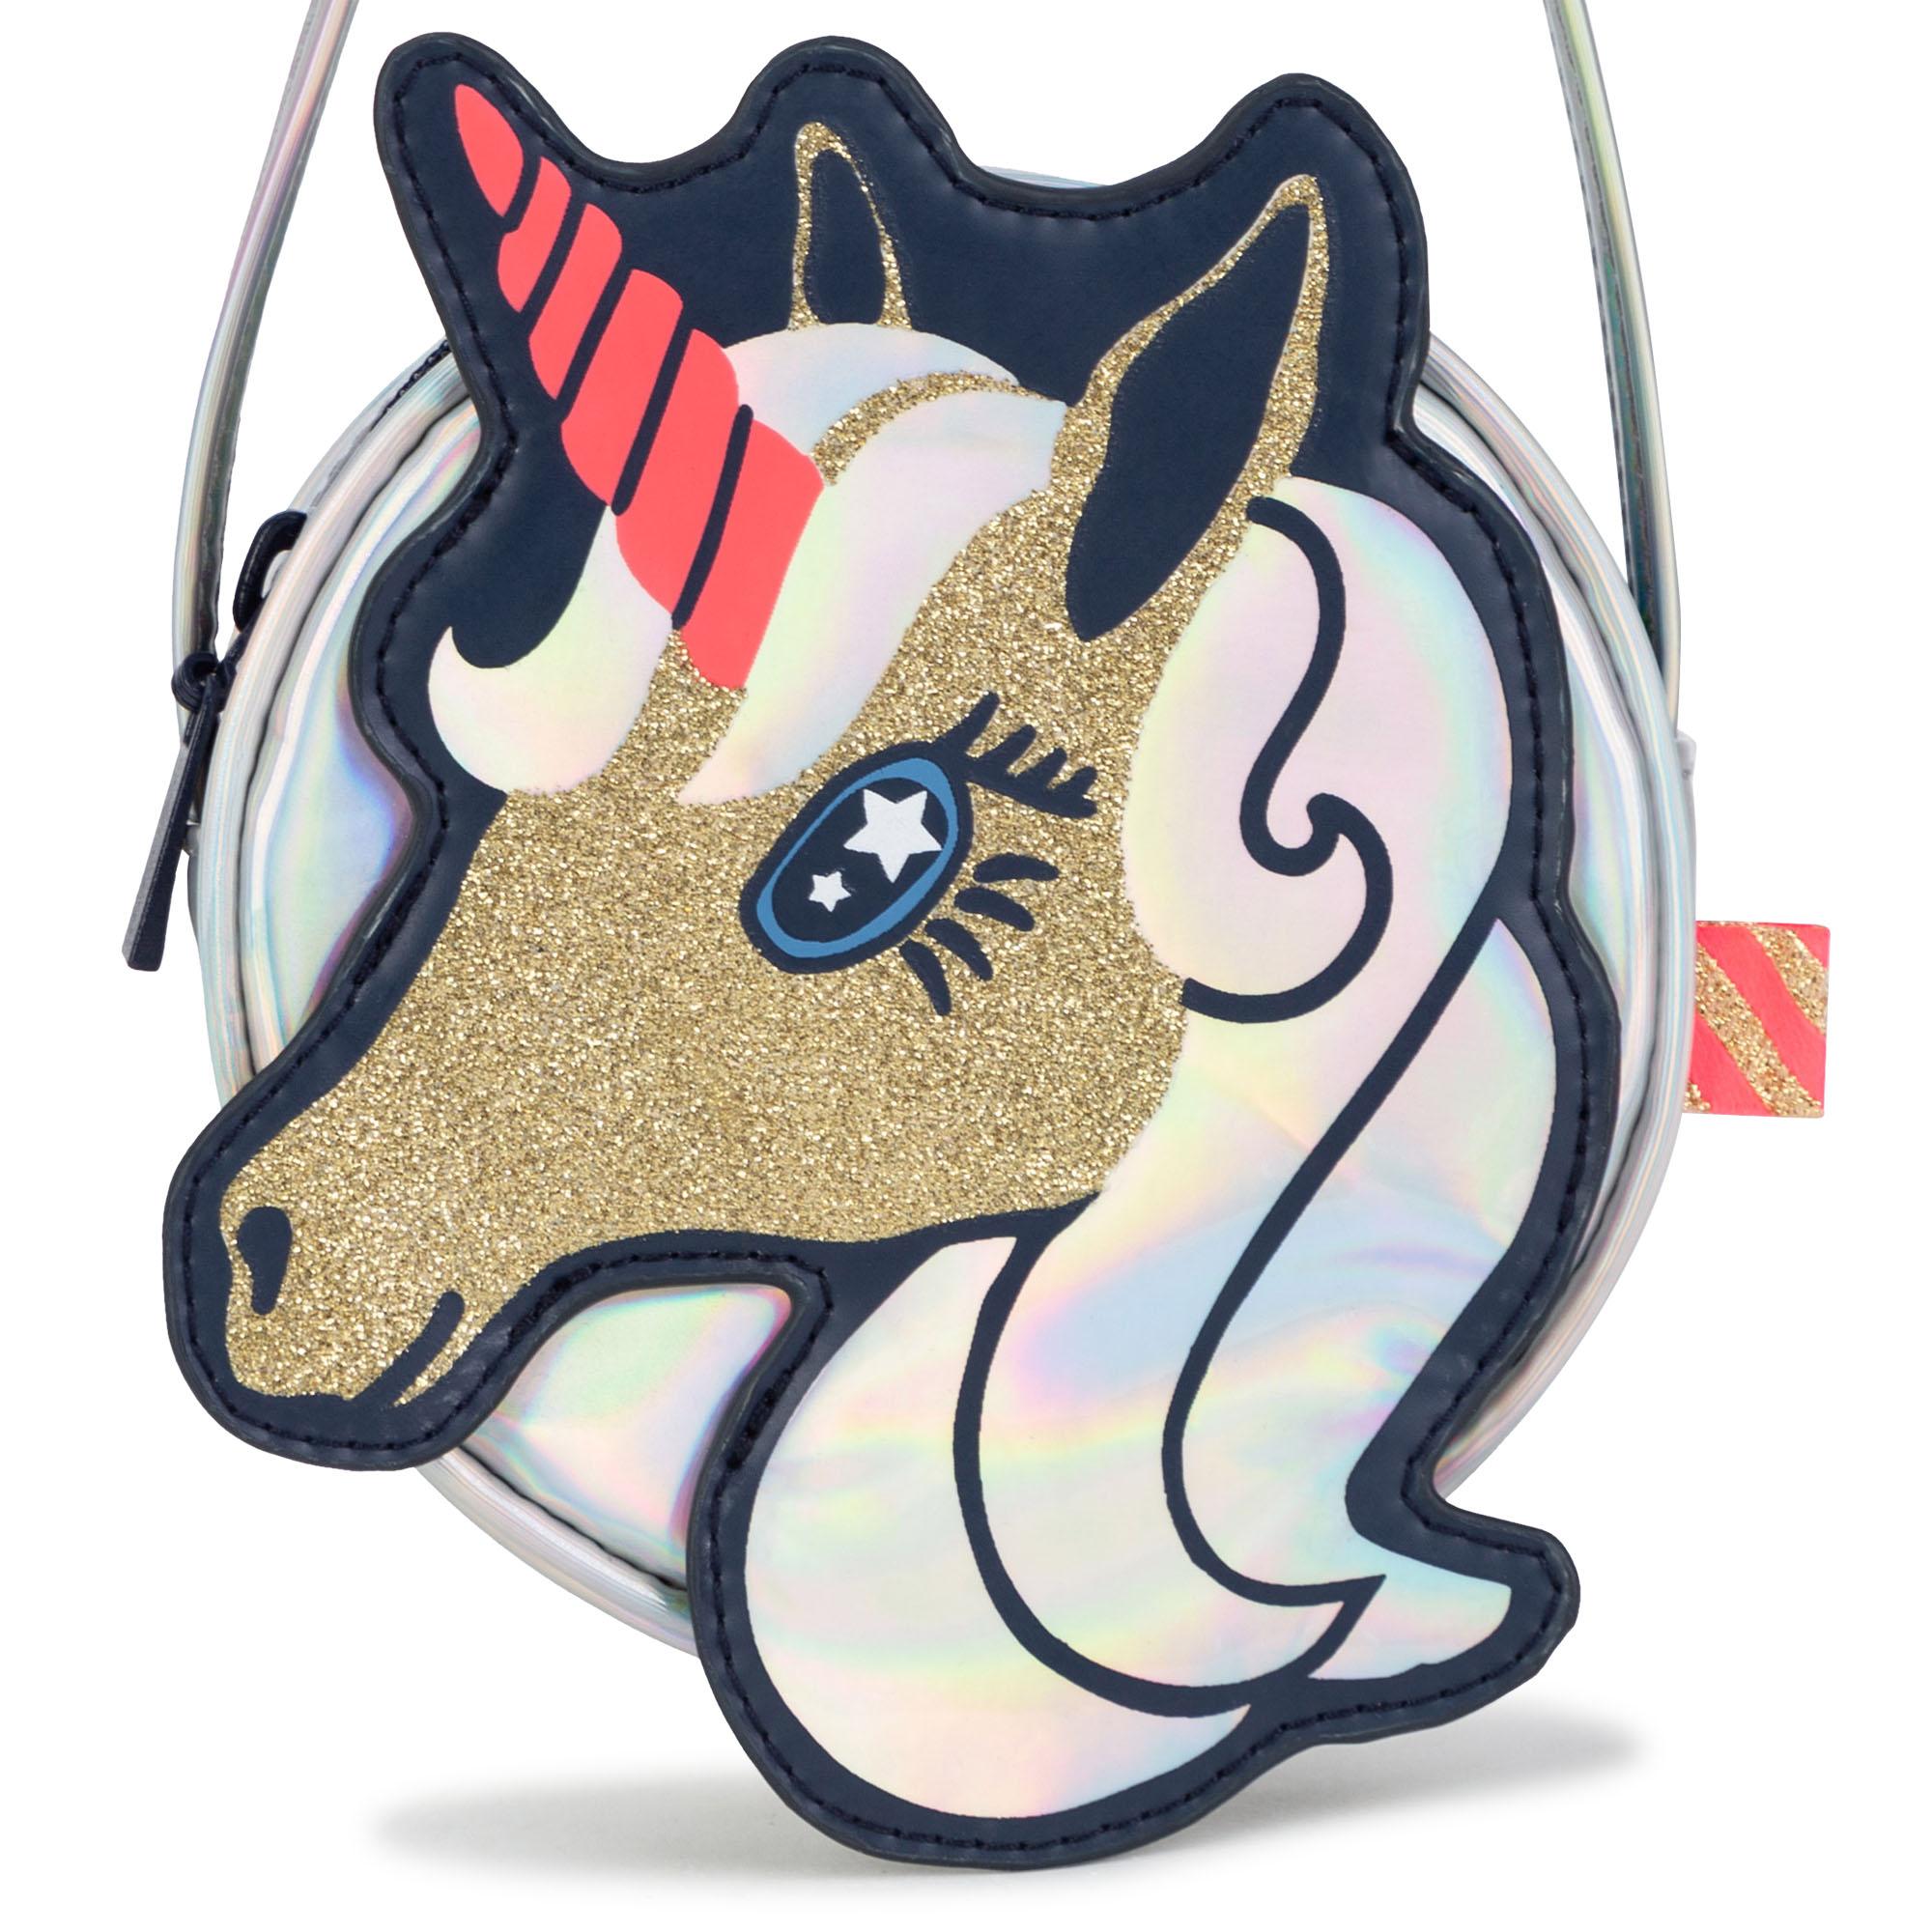 Round unicorn handbag BILLIEBLUSH for GIRL